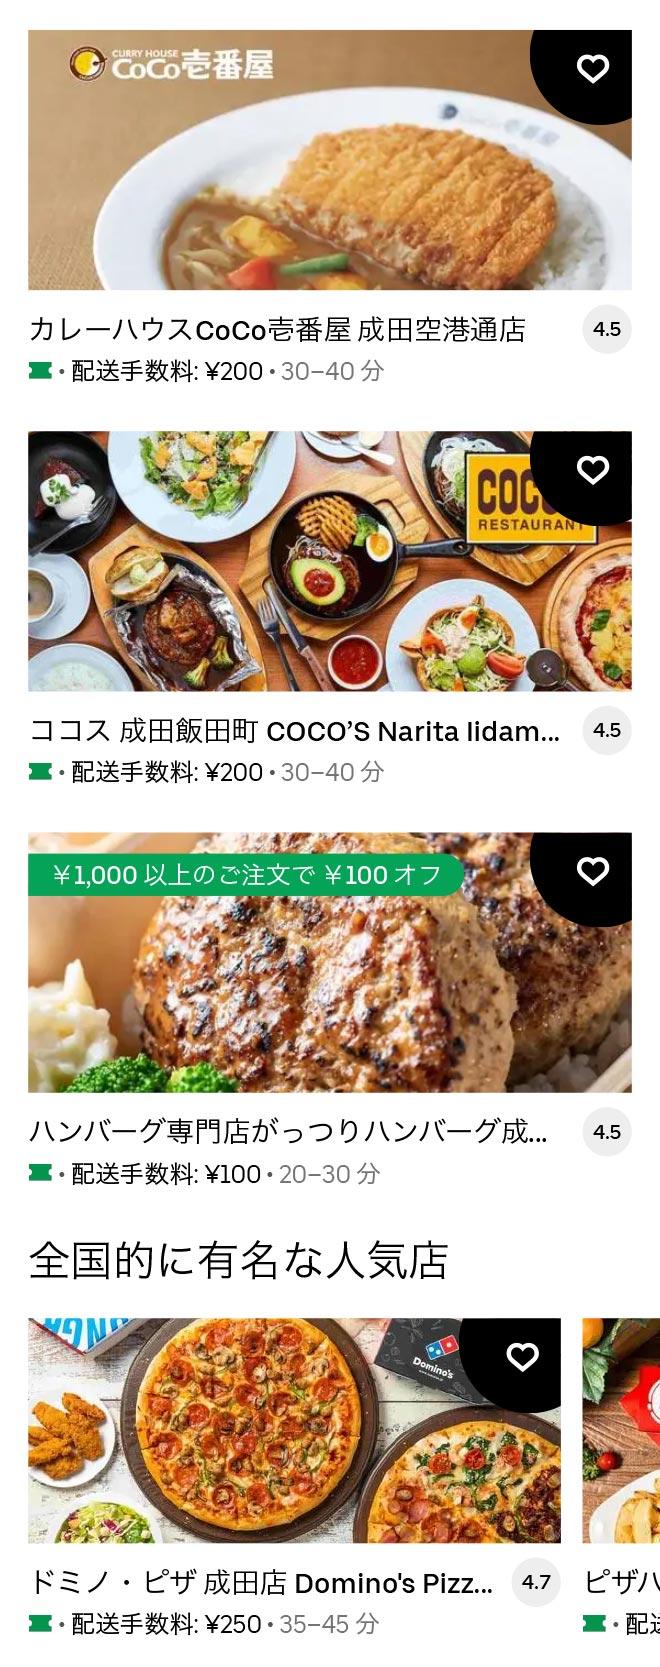 U narita menu 2104 05